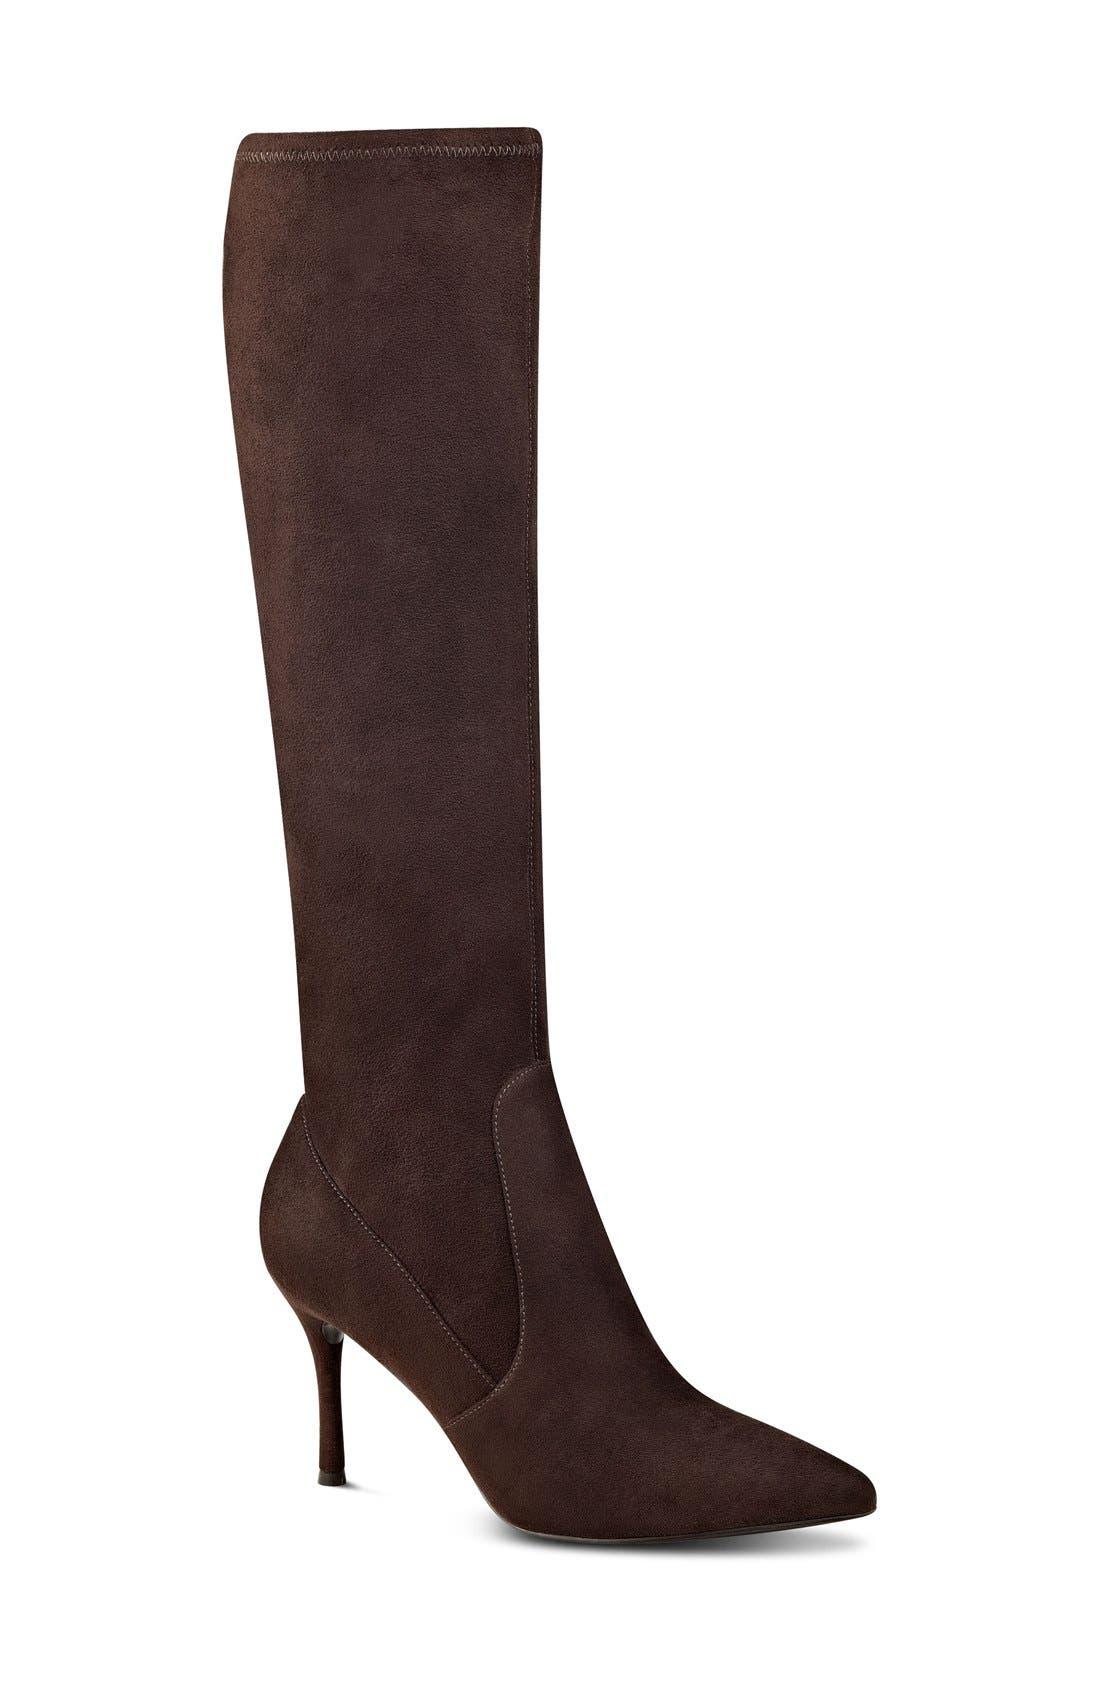 Main Image - Nine West 'Calla' Knee-High Boot (Women)